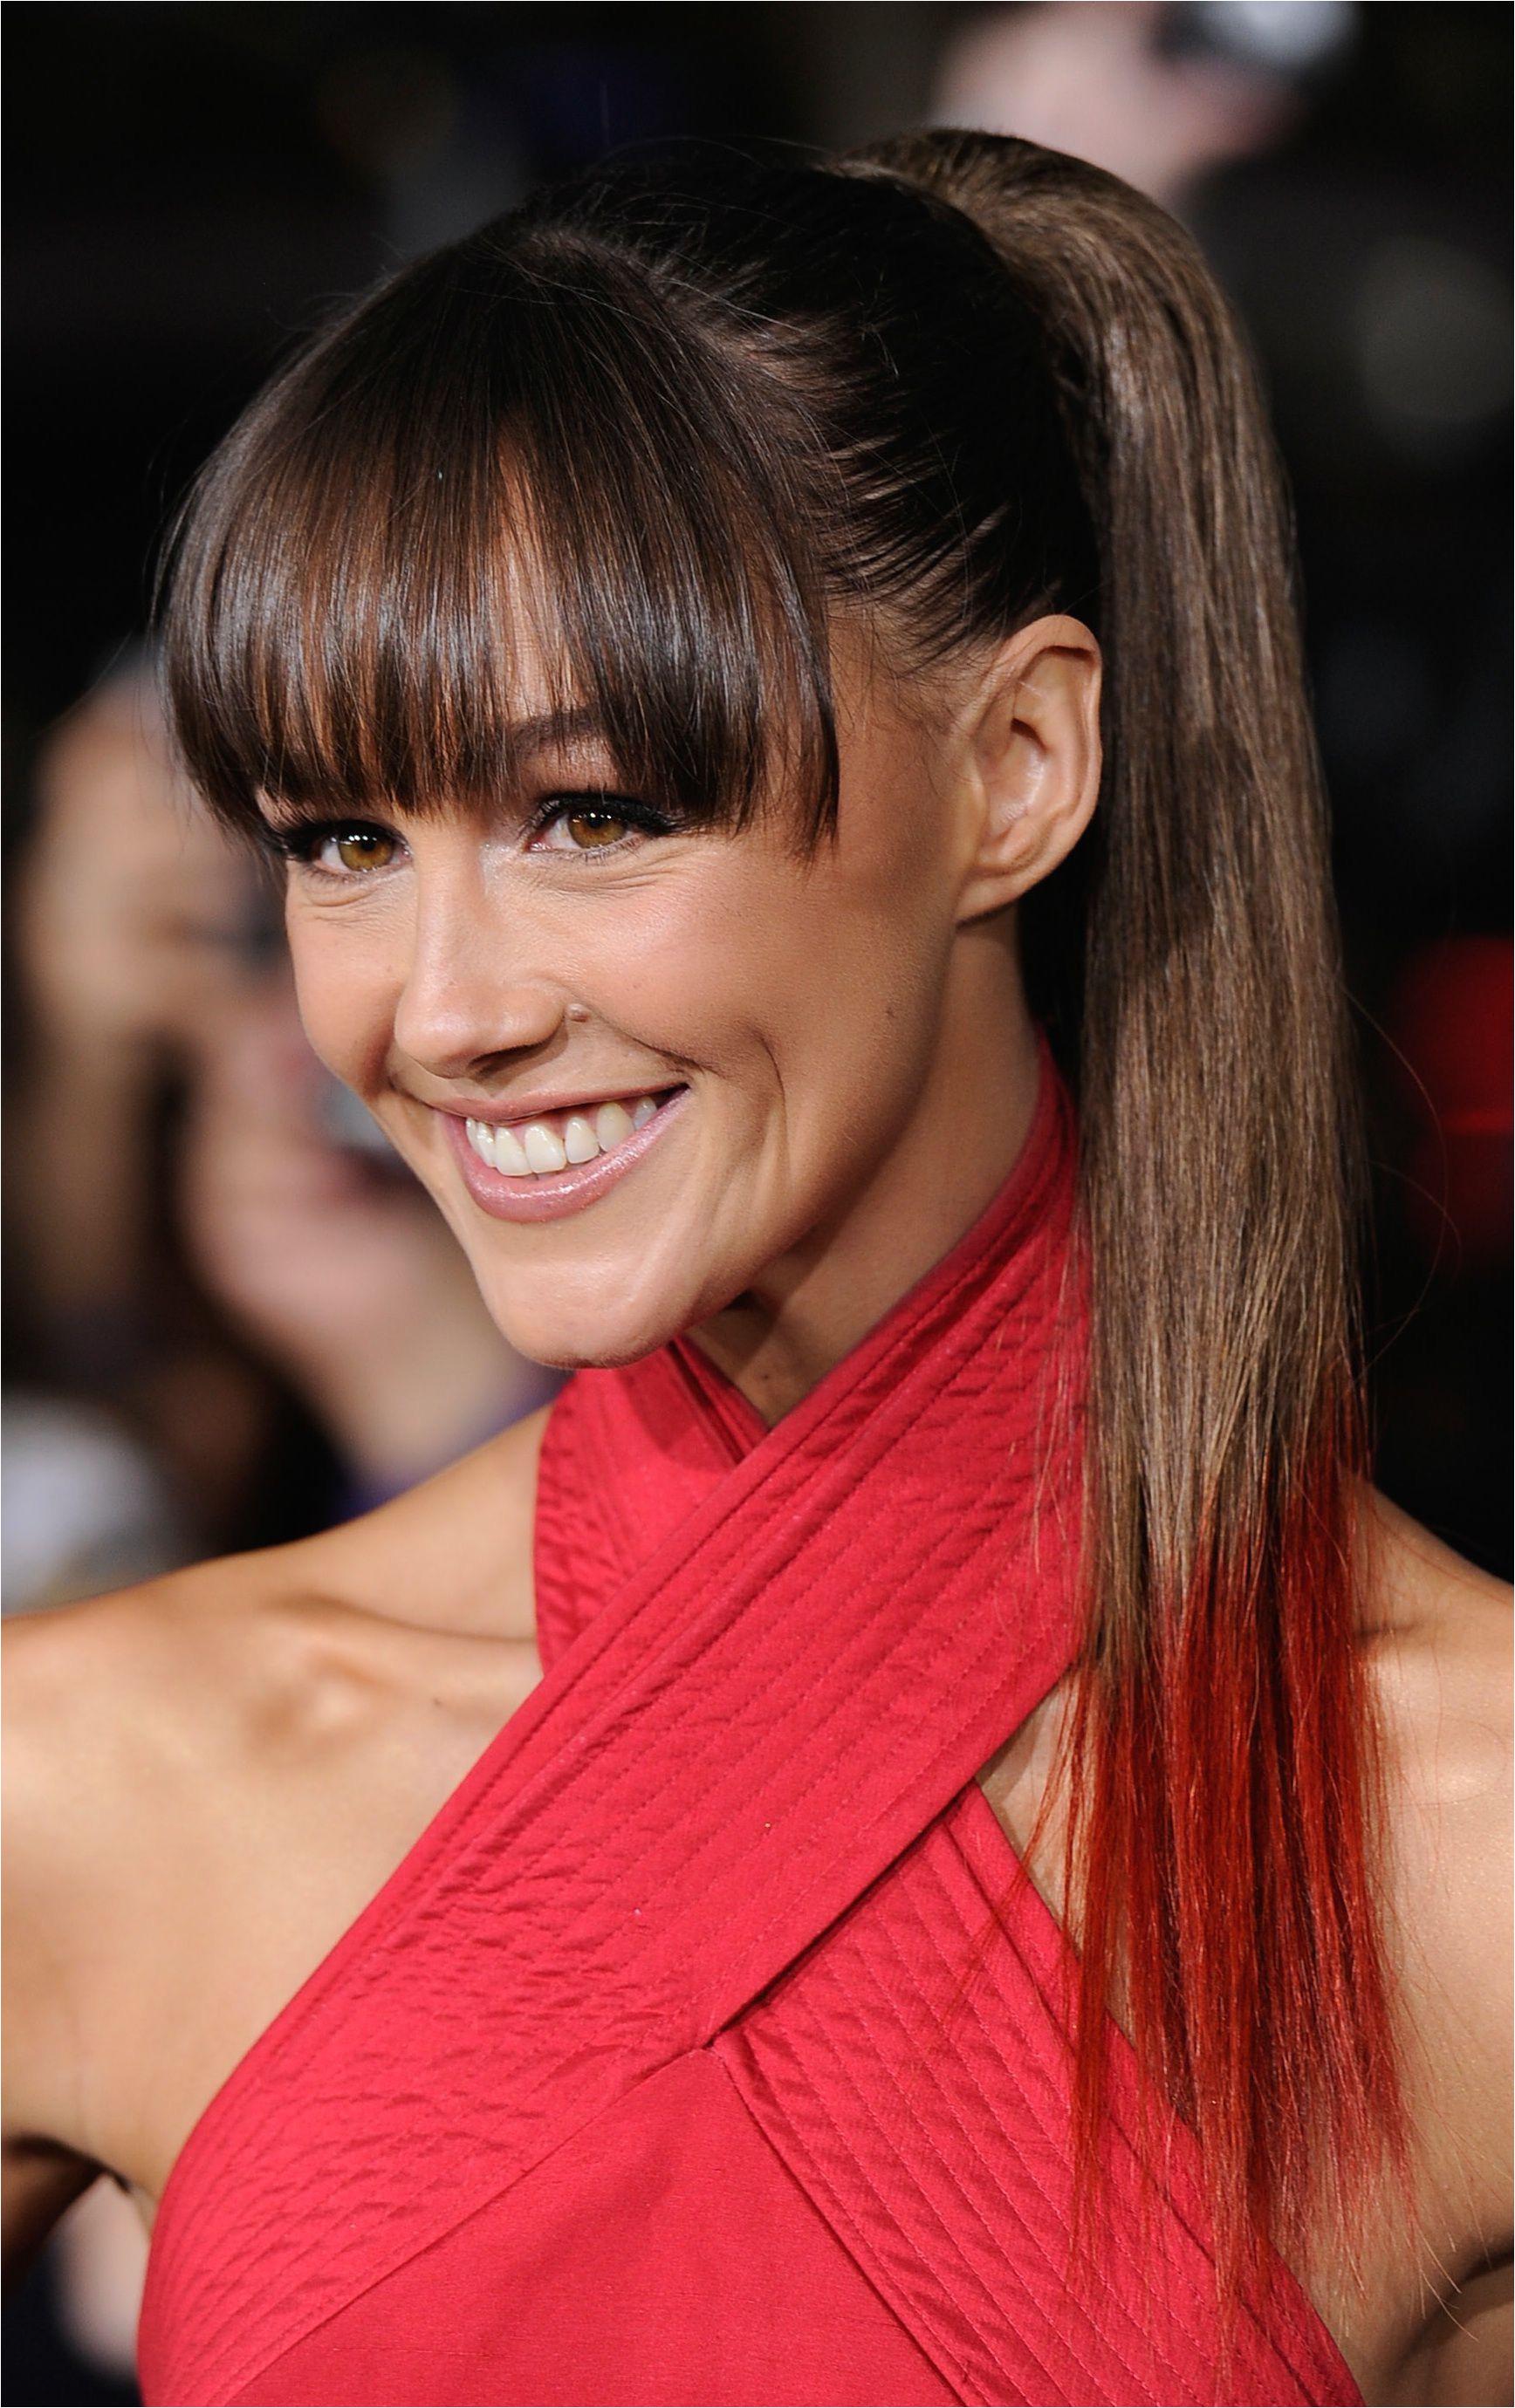 Dip Dye Hairstyles with Fringe Dip Dye Hair Color 20 Amazing Hairstyles